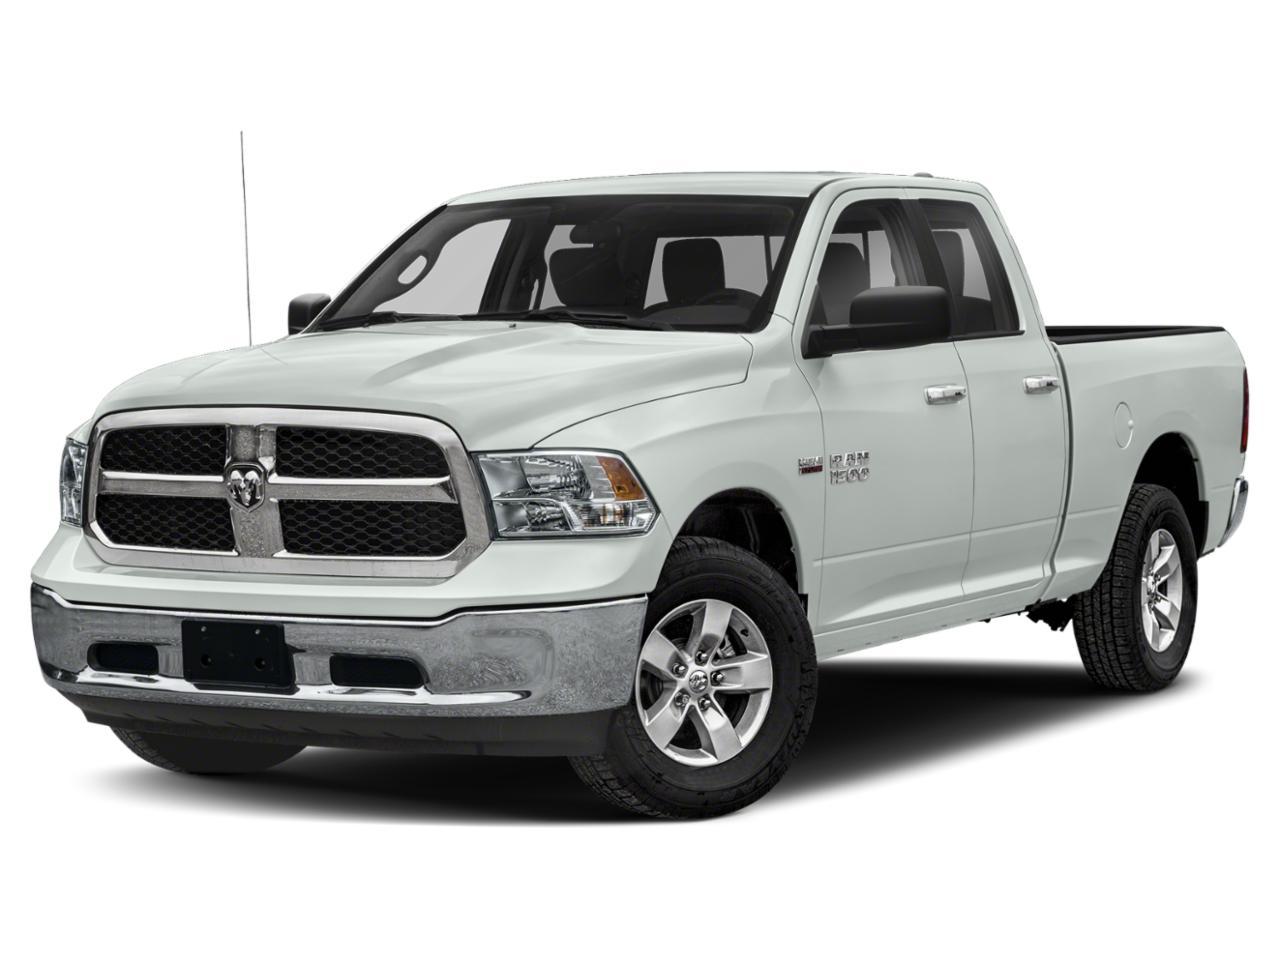 Cars Trucks Suvs For Sale Worthington Marthaler Auto Group